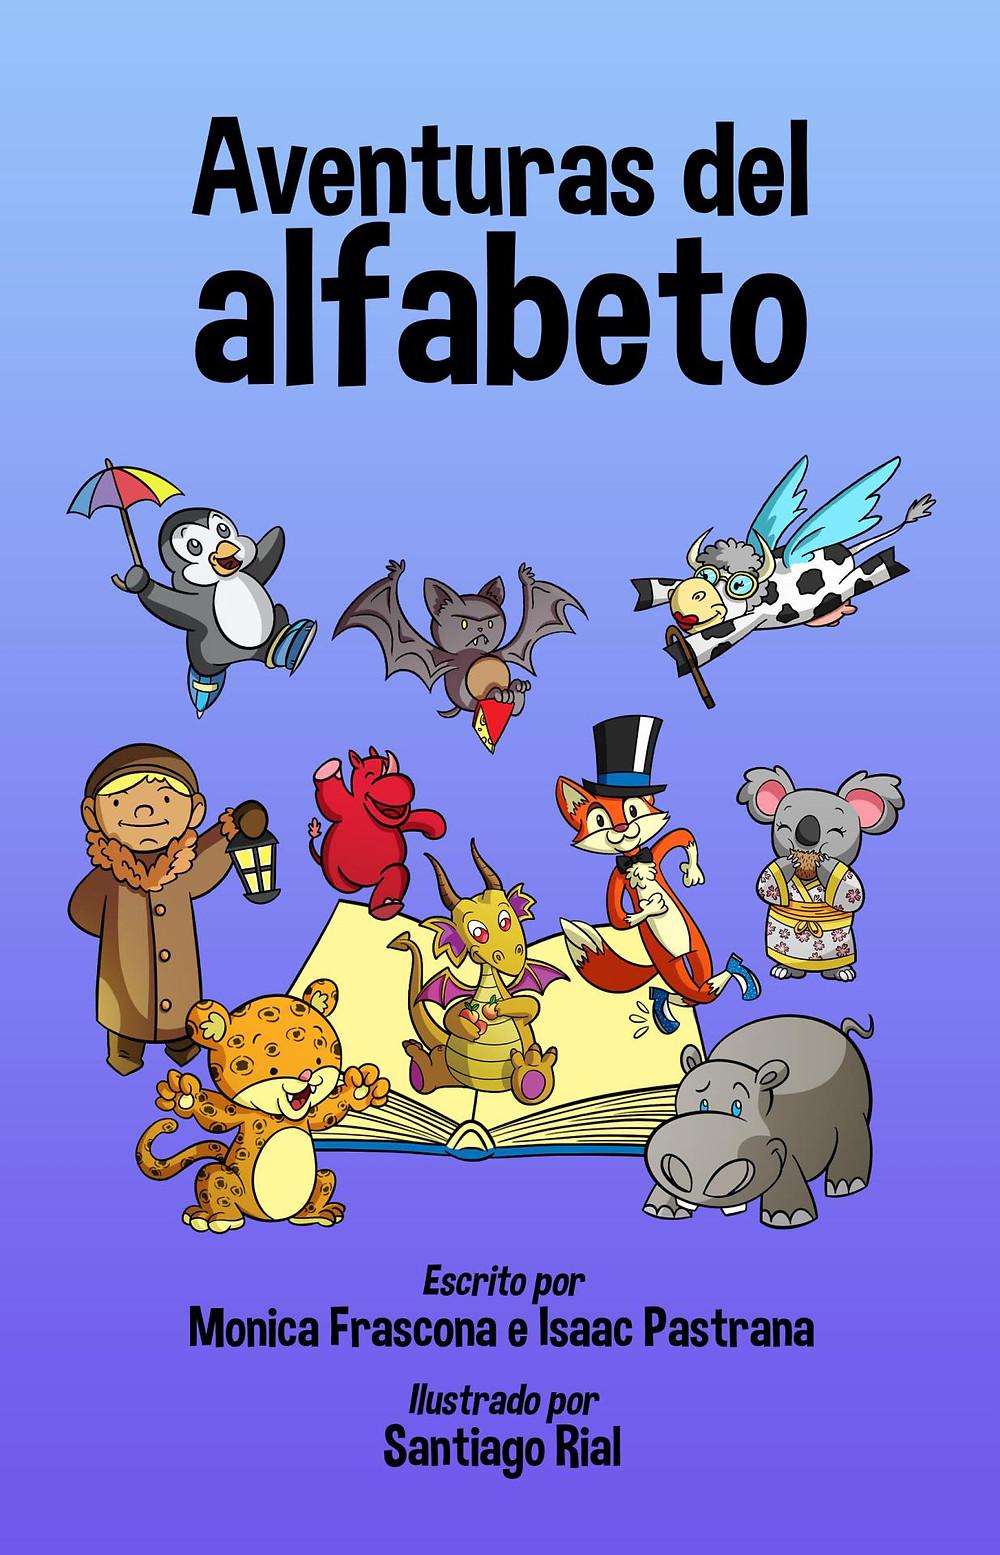 Libros infantiles - Alphabet book in Spanish for kids